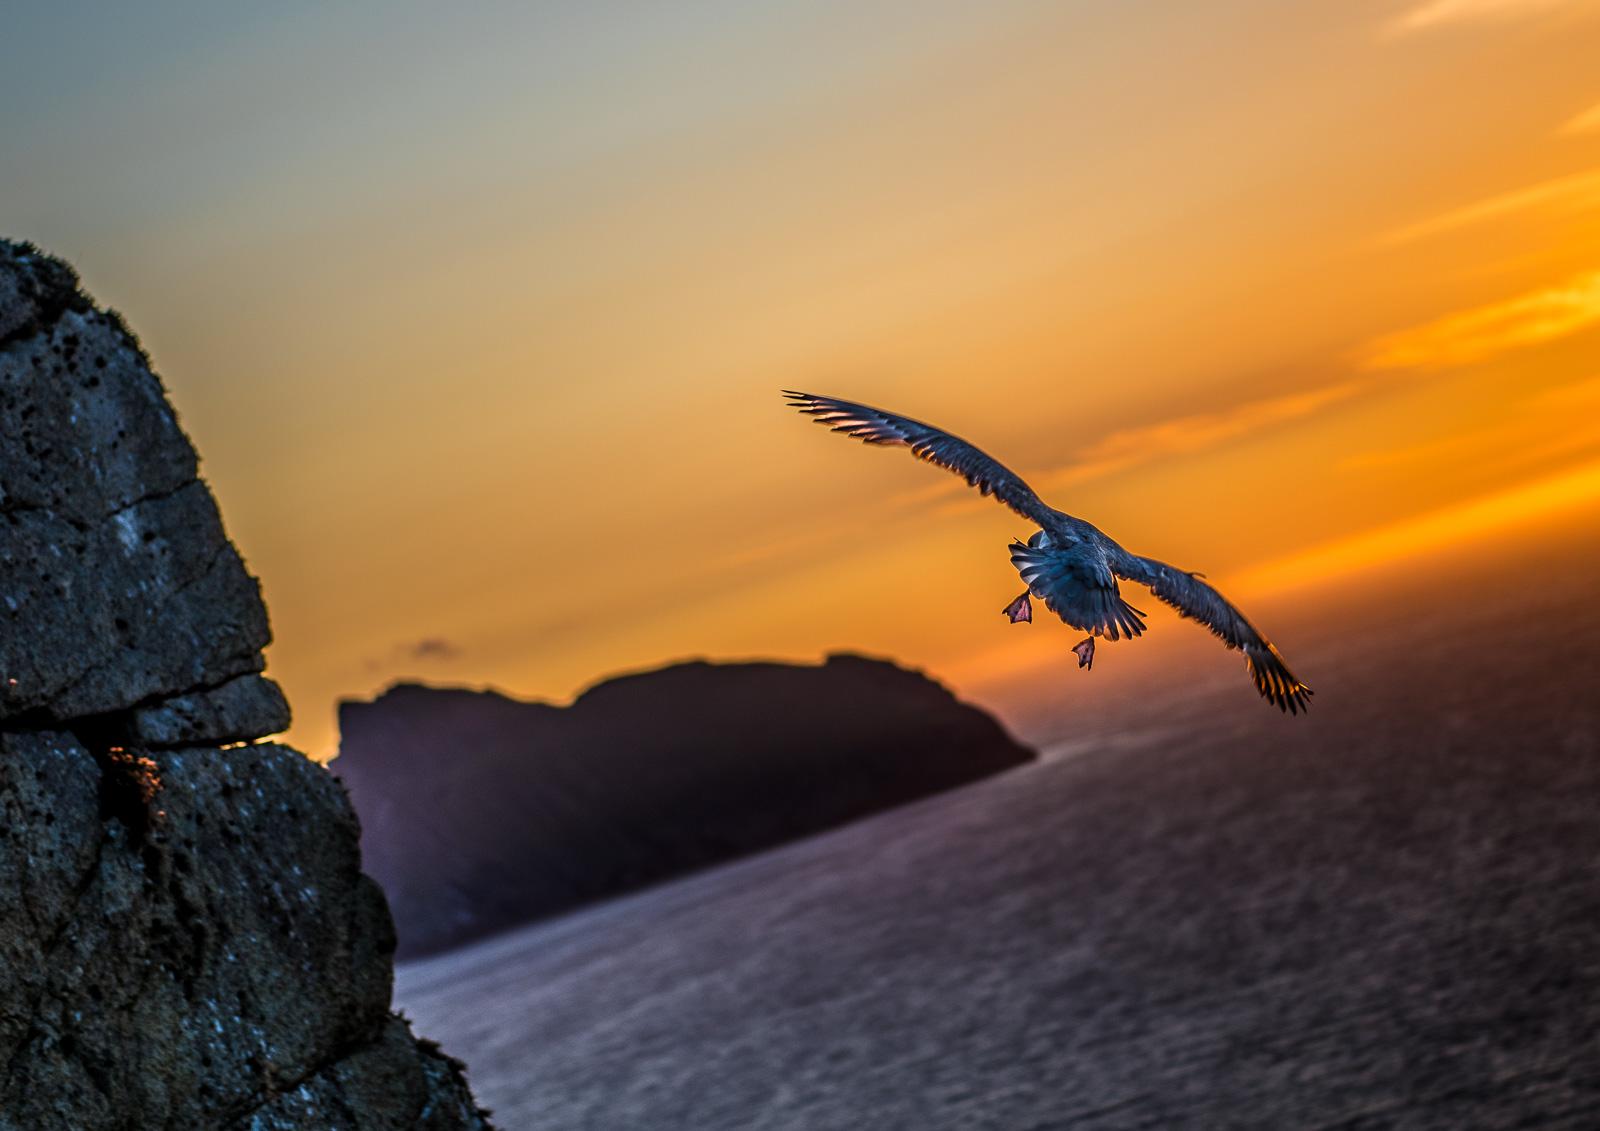 Fulmar hovering over Conachair cliffs.  Nikon D810 24-70mm f2.8 at 70mm. 1/800sec f2.8 ISO 64